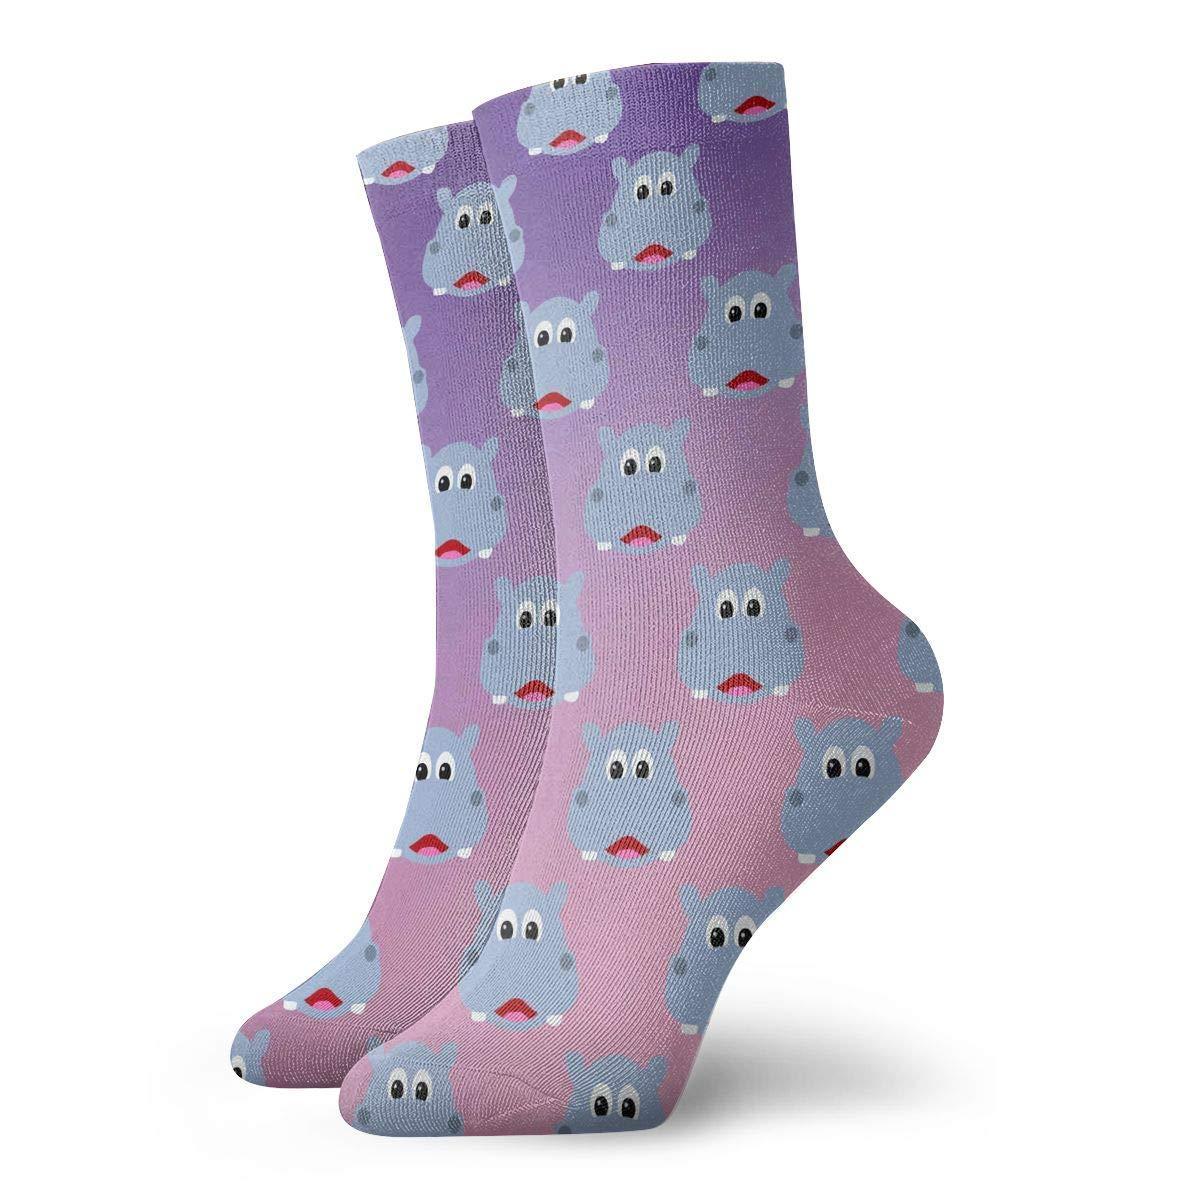 Space Unisex Funny Casual Crew Socks Athletic Socks For Boys Girls Kids Teenagers